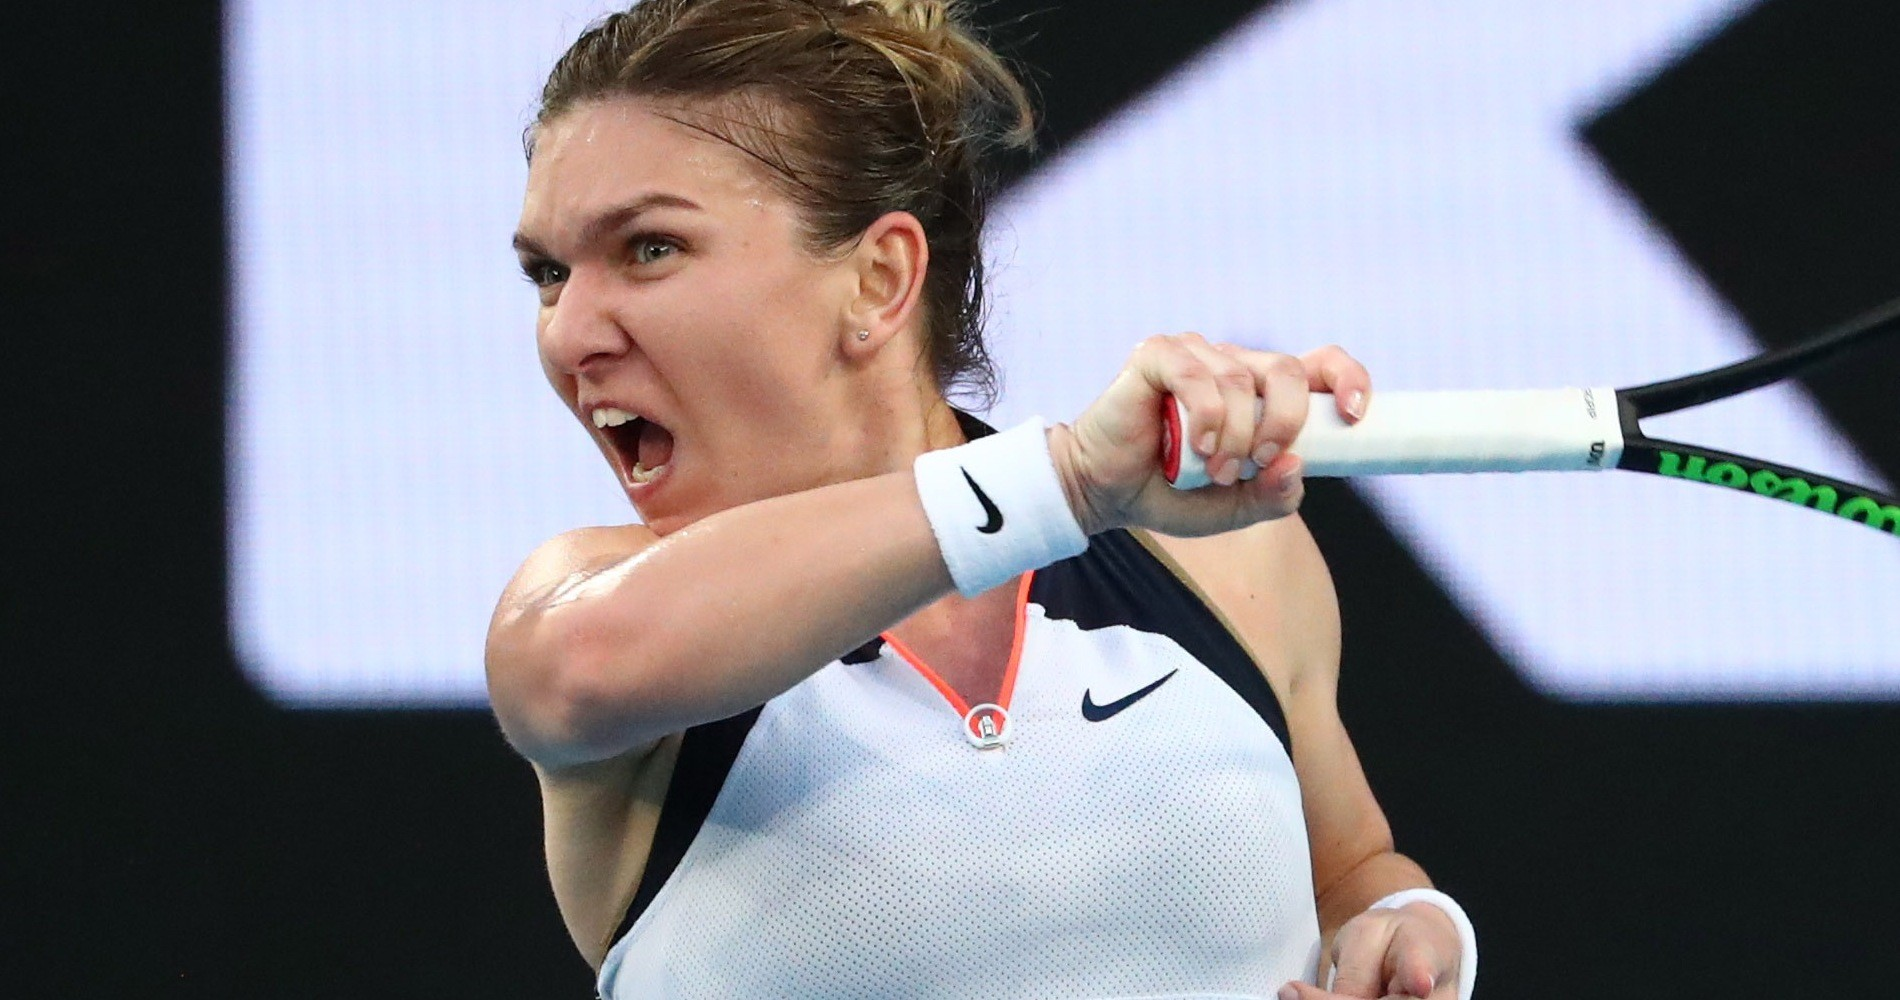 Simona_Halep_Australian Open_R2_2021